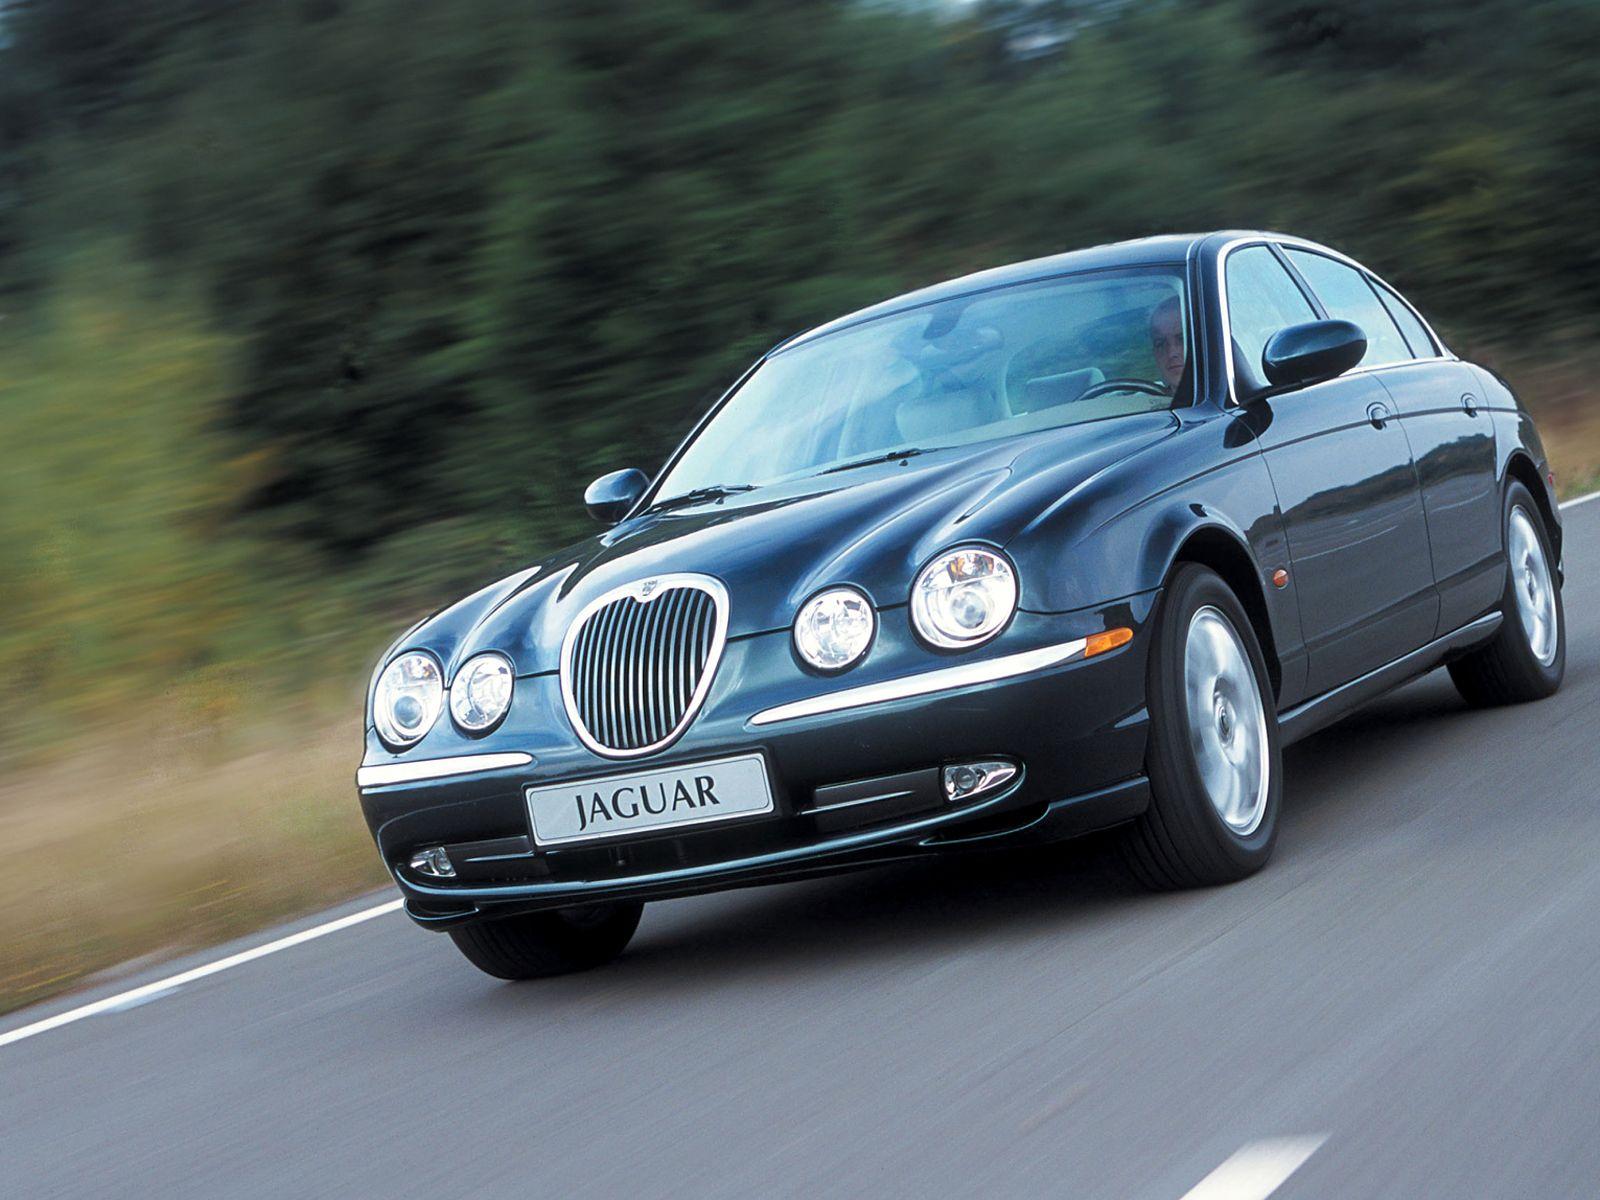 jaguar-s-type-04